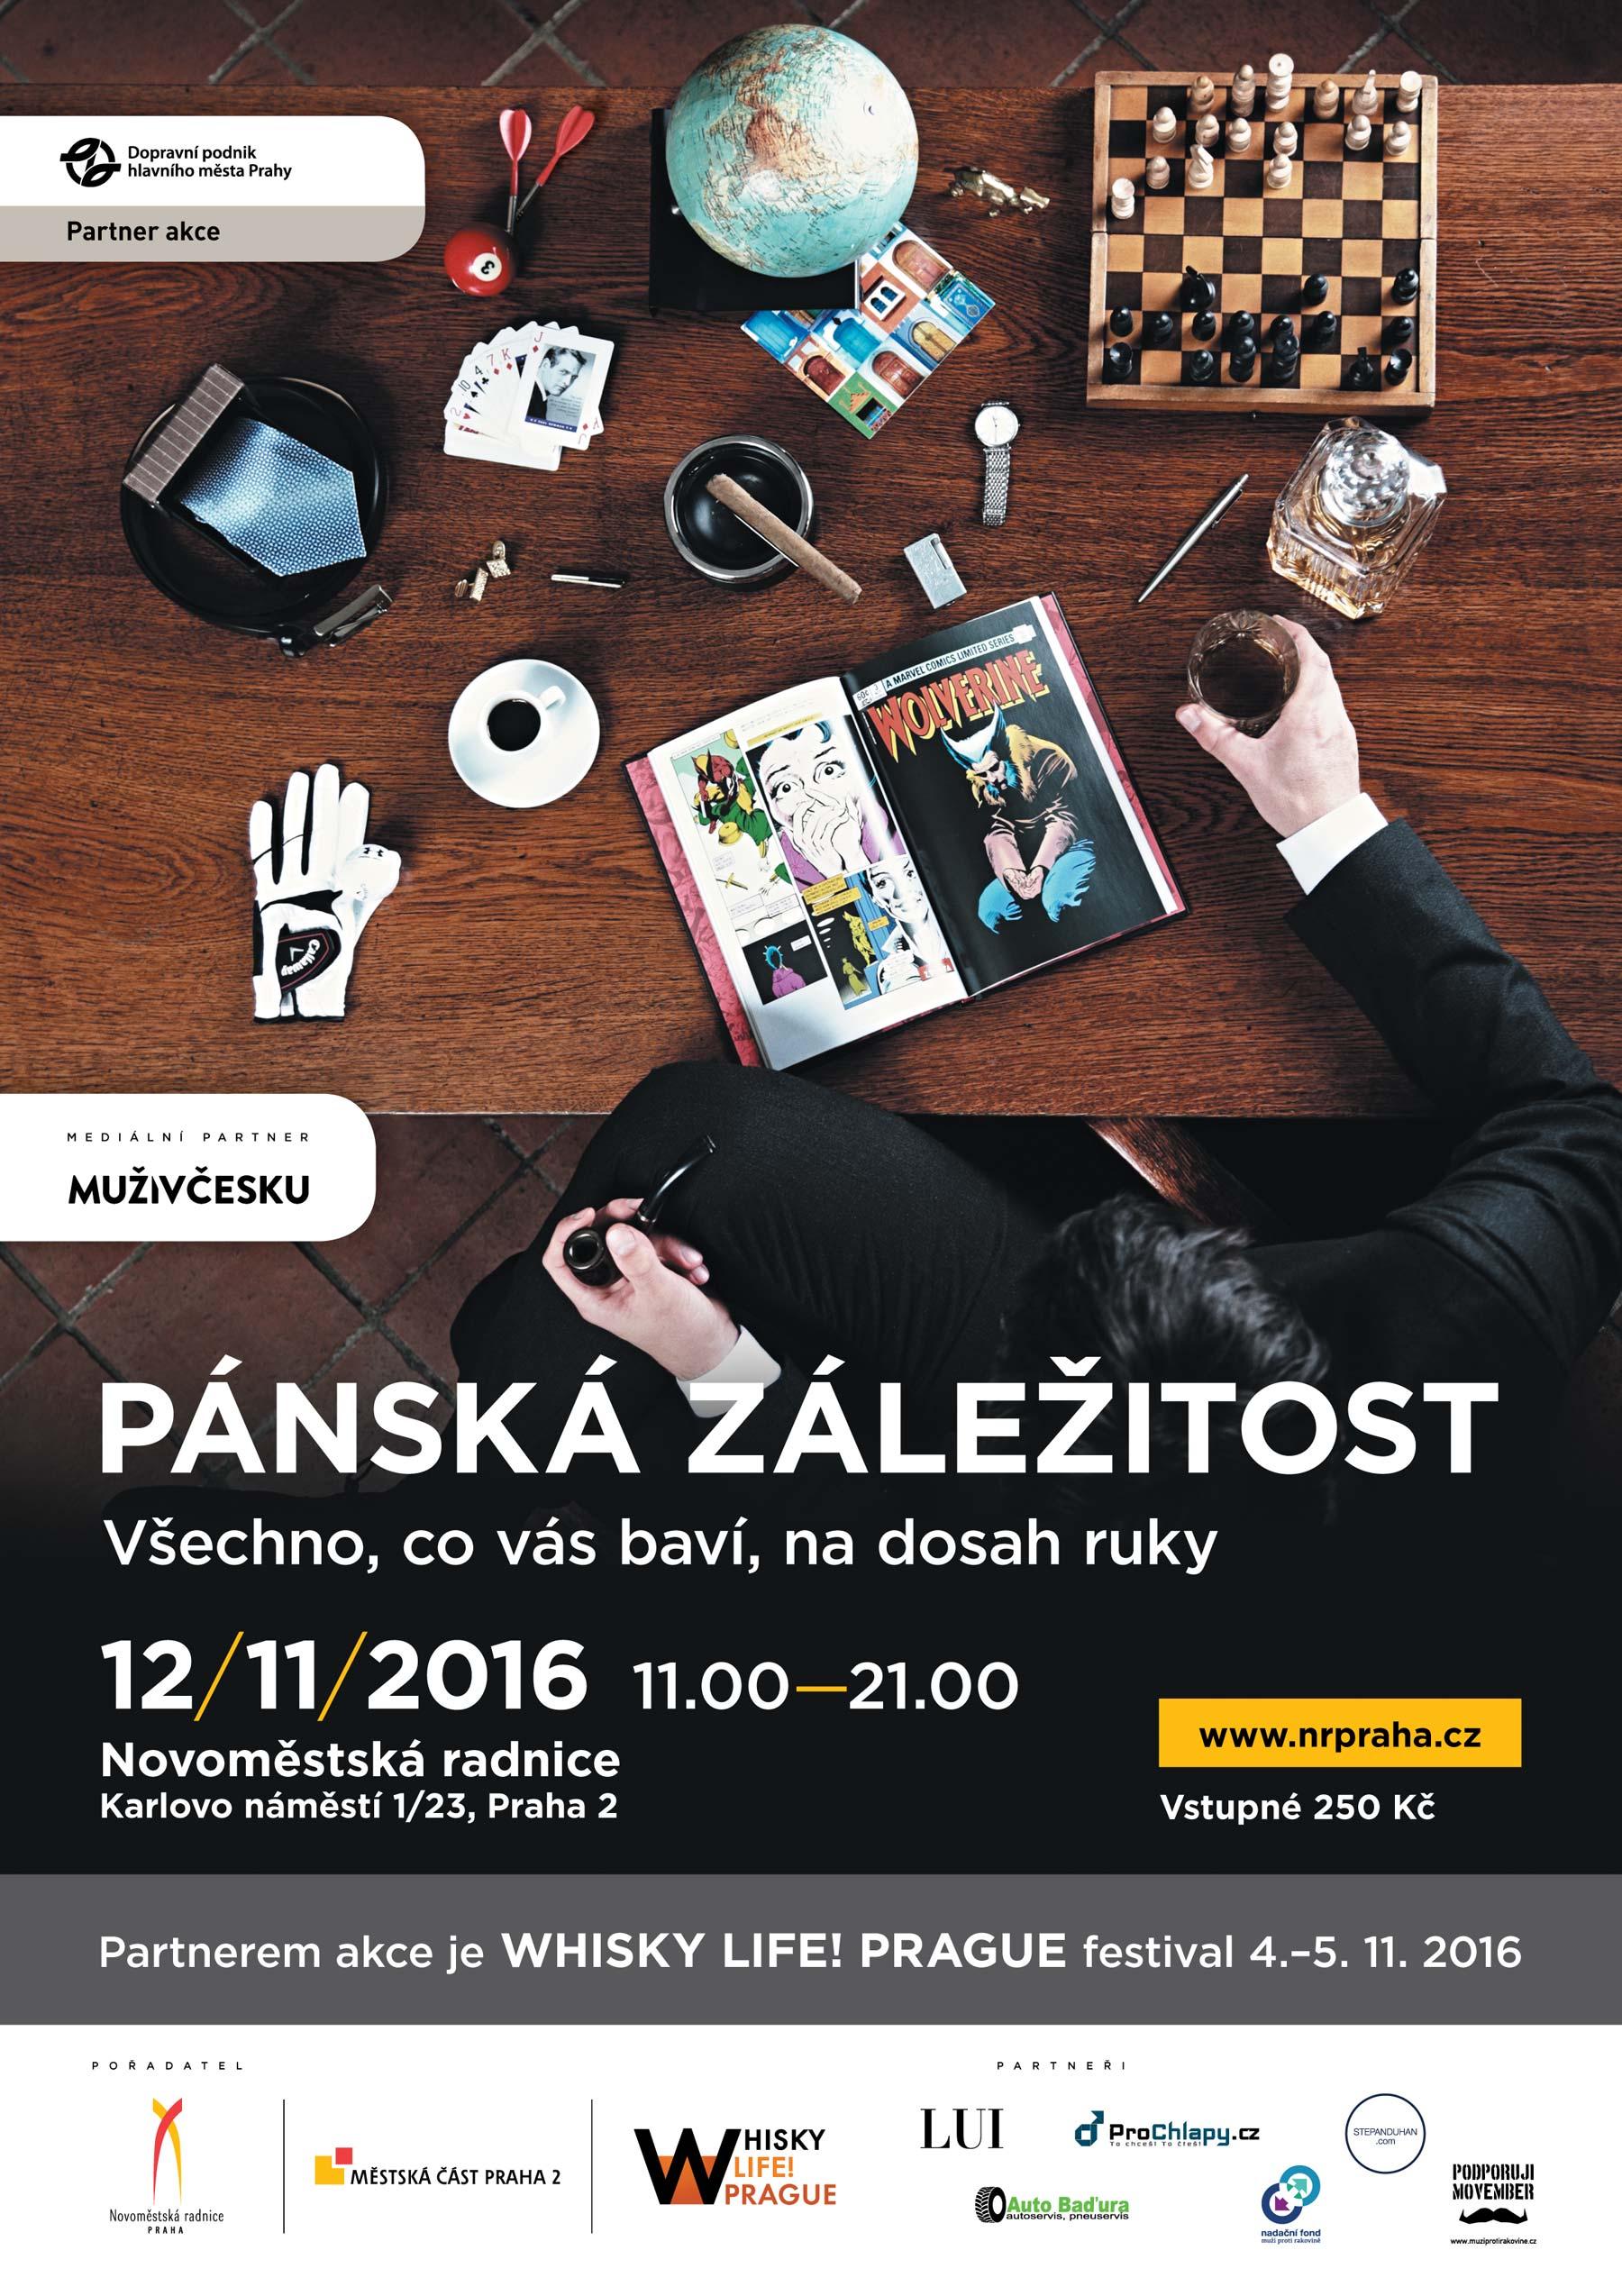 panska-zalezitost_plakat_email